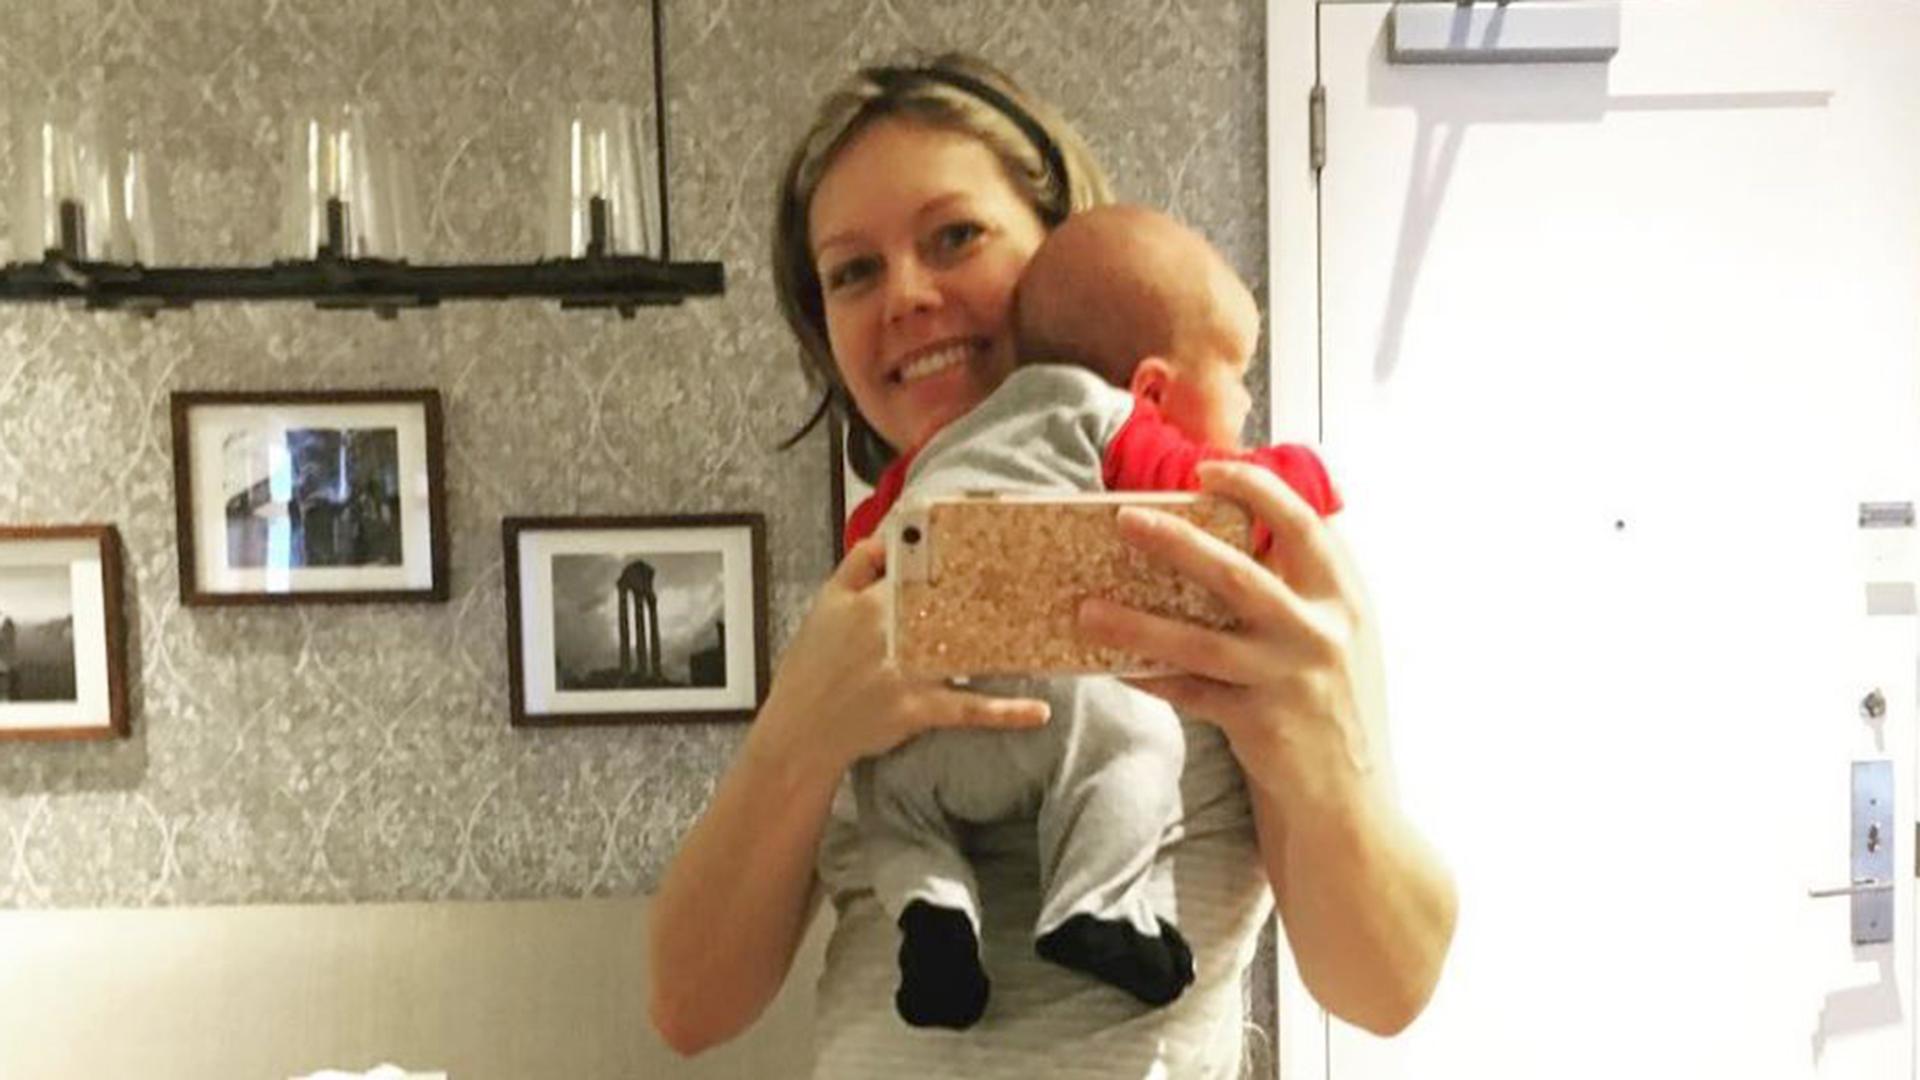 one more week of sweatpants dylan dreyer announces her return to one more week of sweatpants dylan dreyer announces her return to com